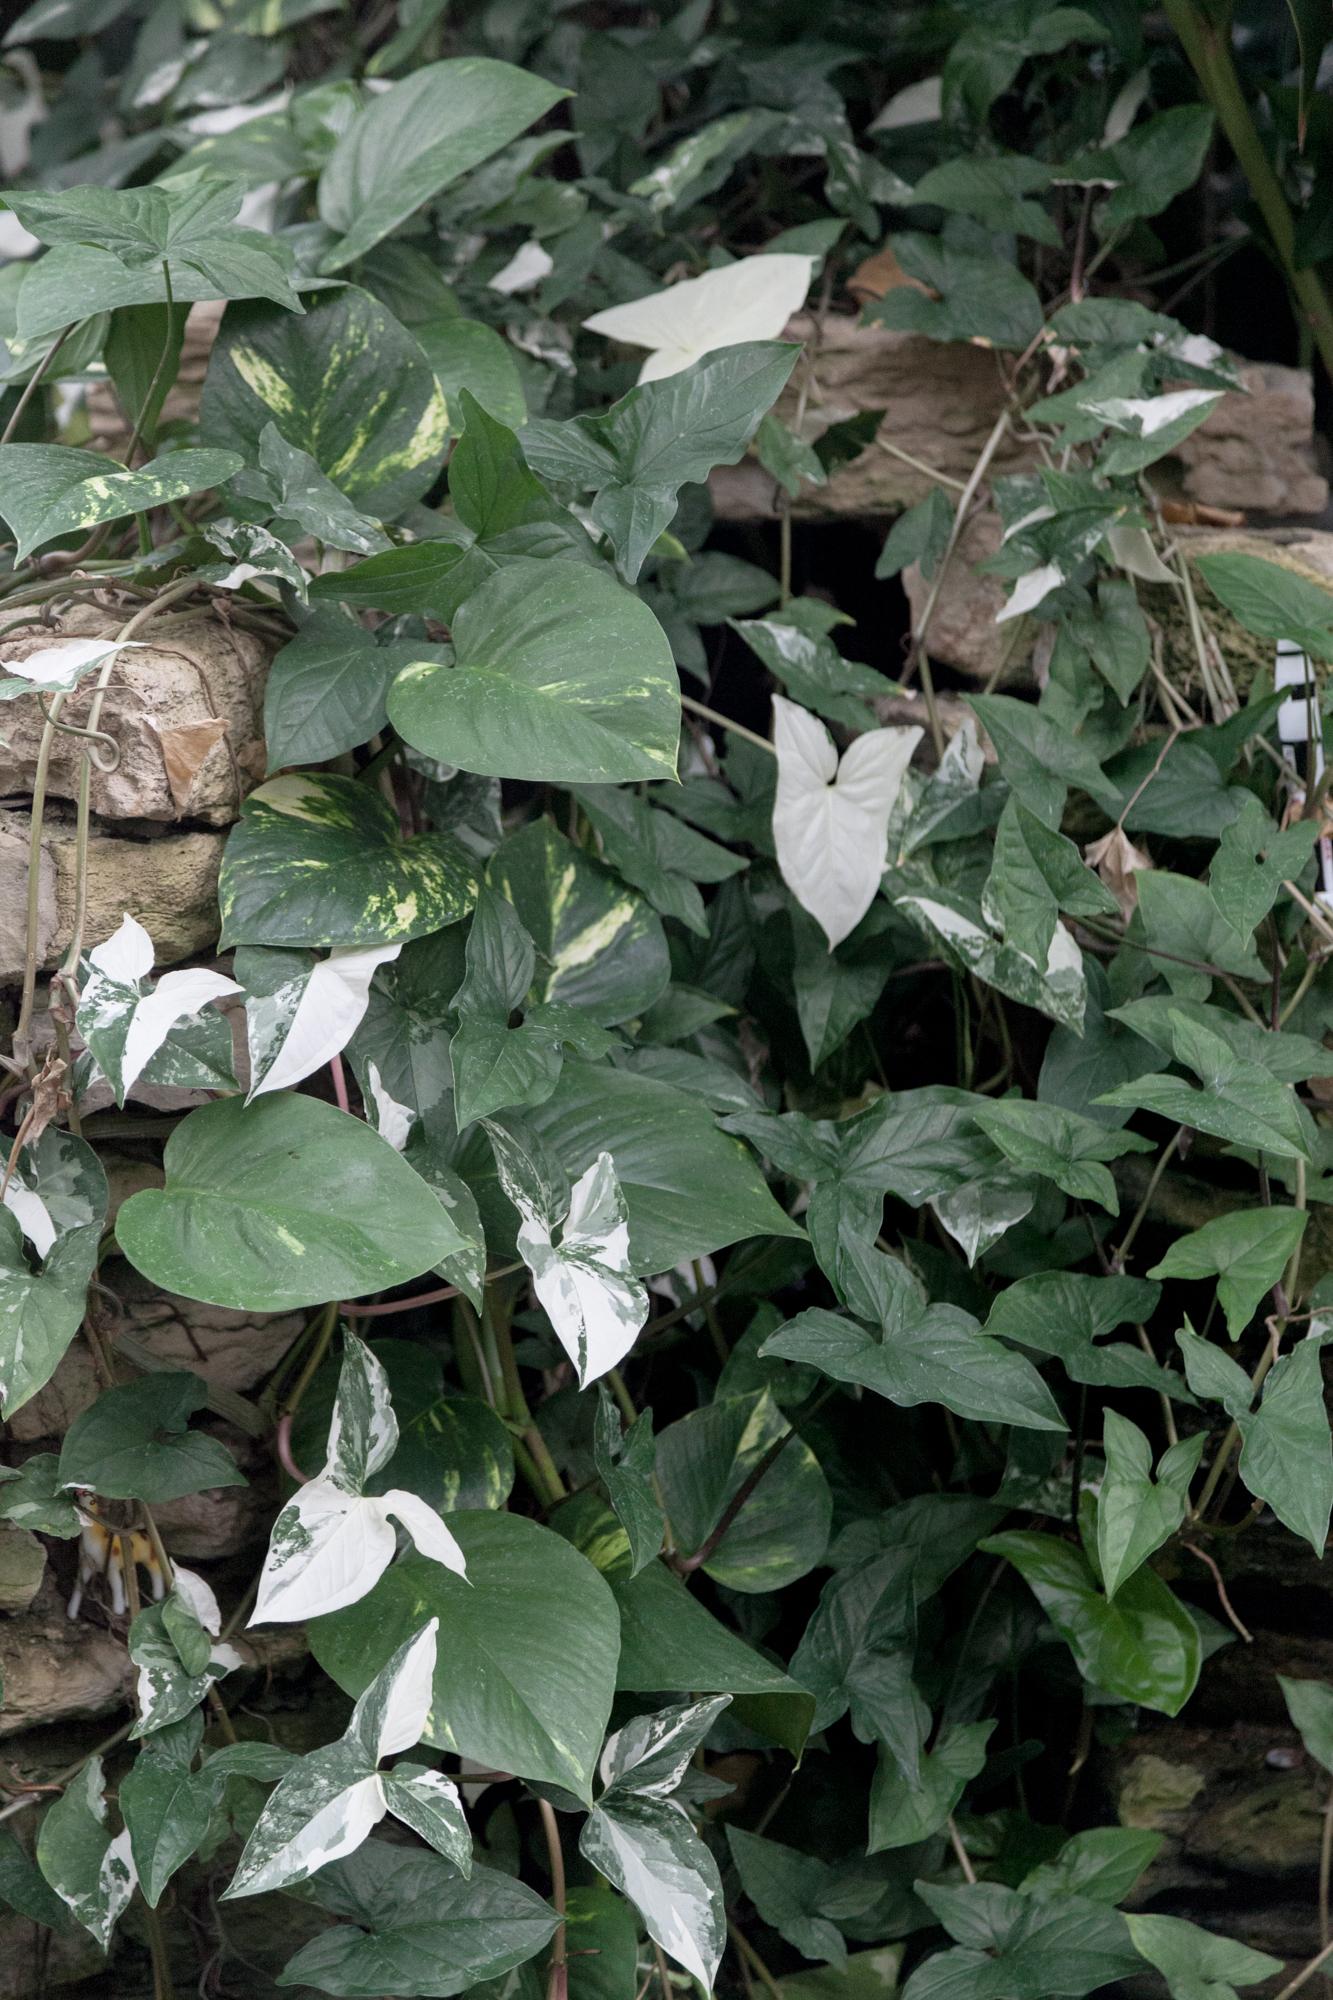 Syngonium podophyllum albo-variegatum growing at the conservatory.